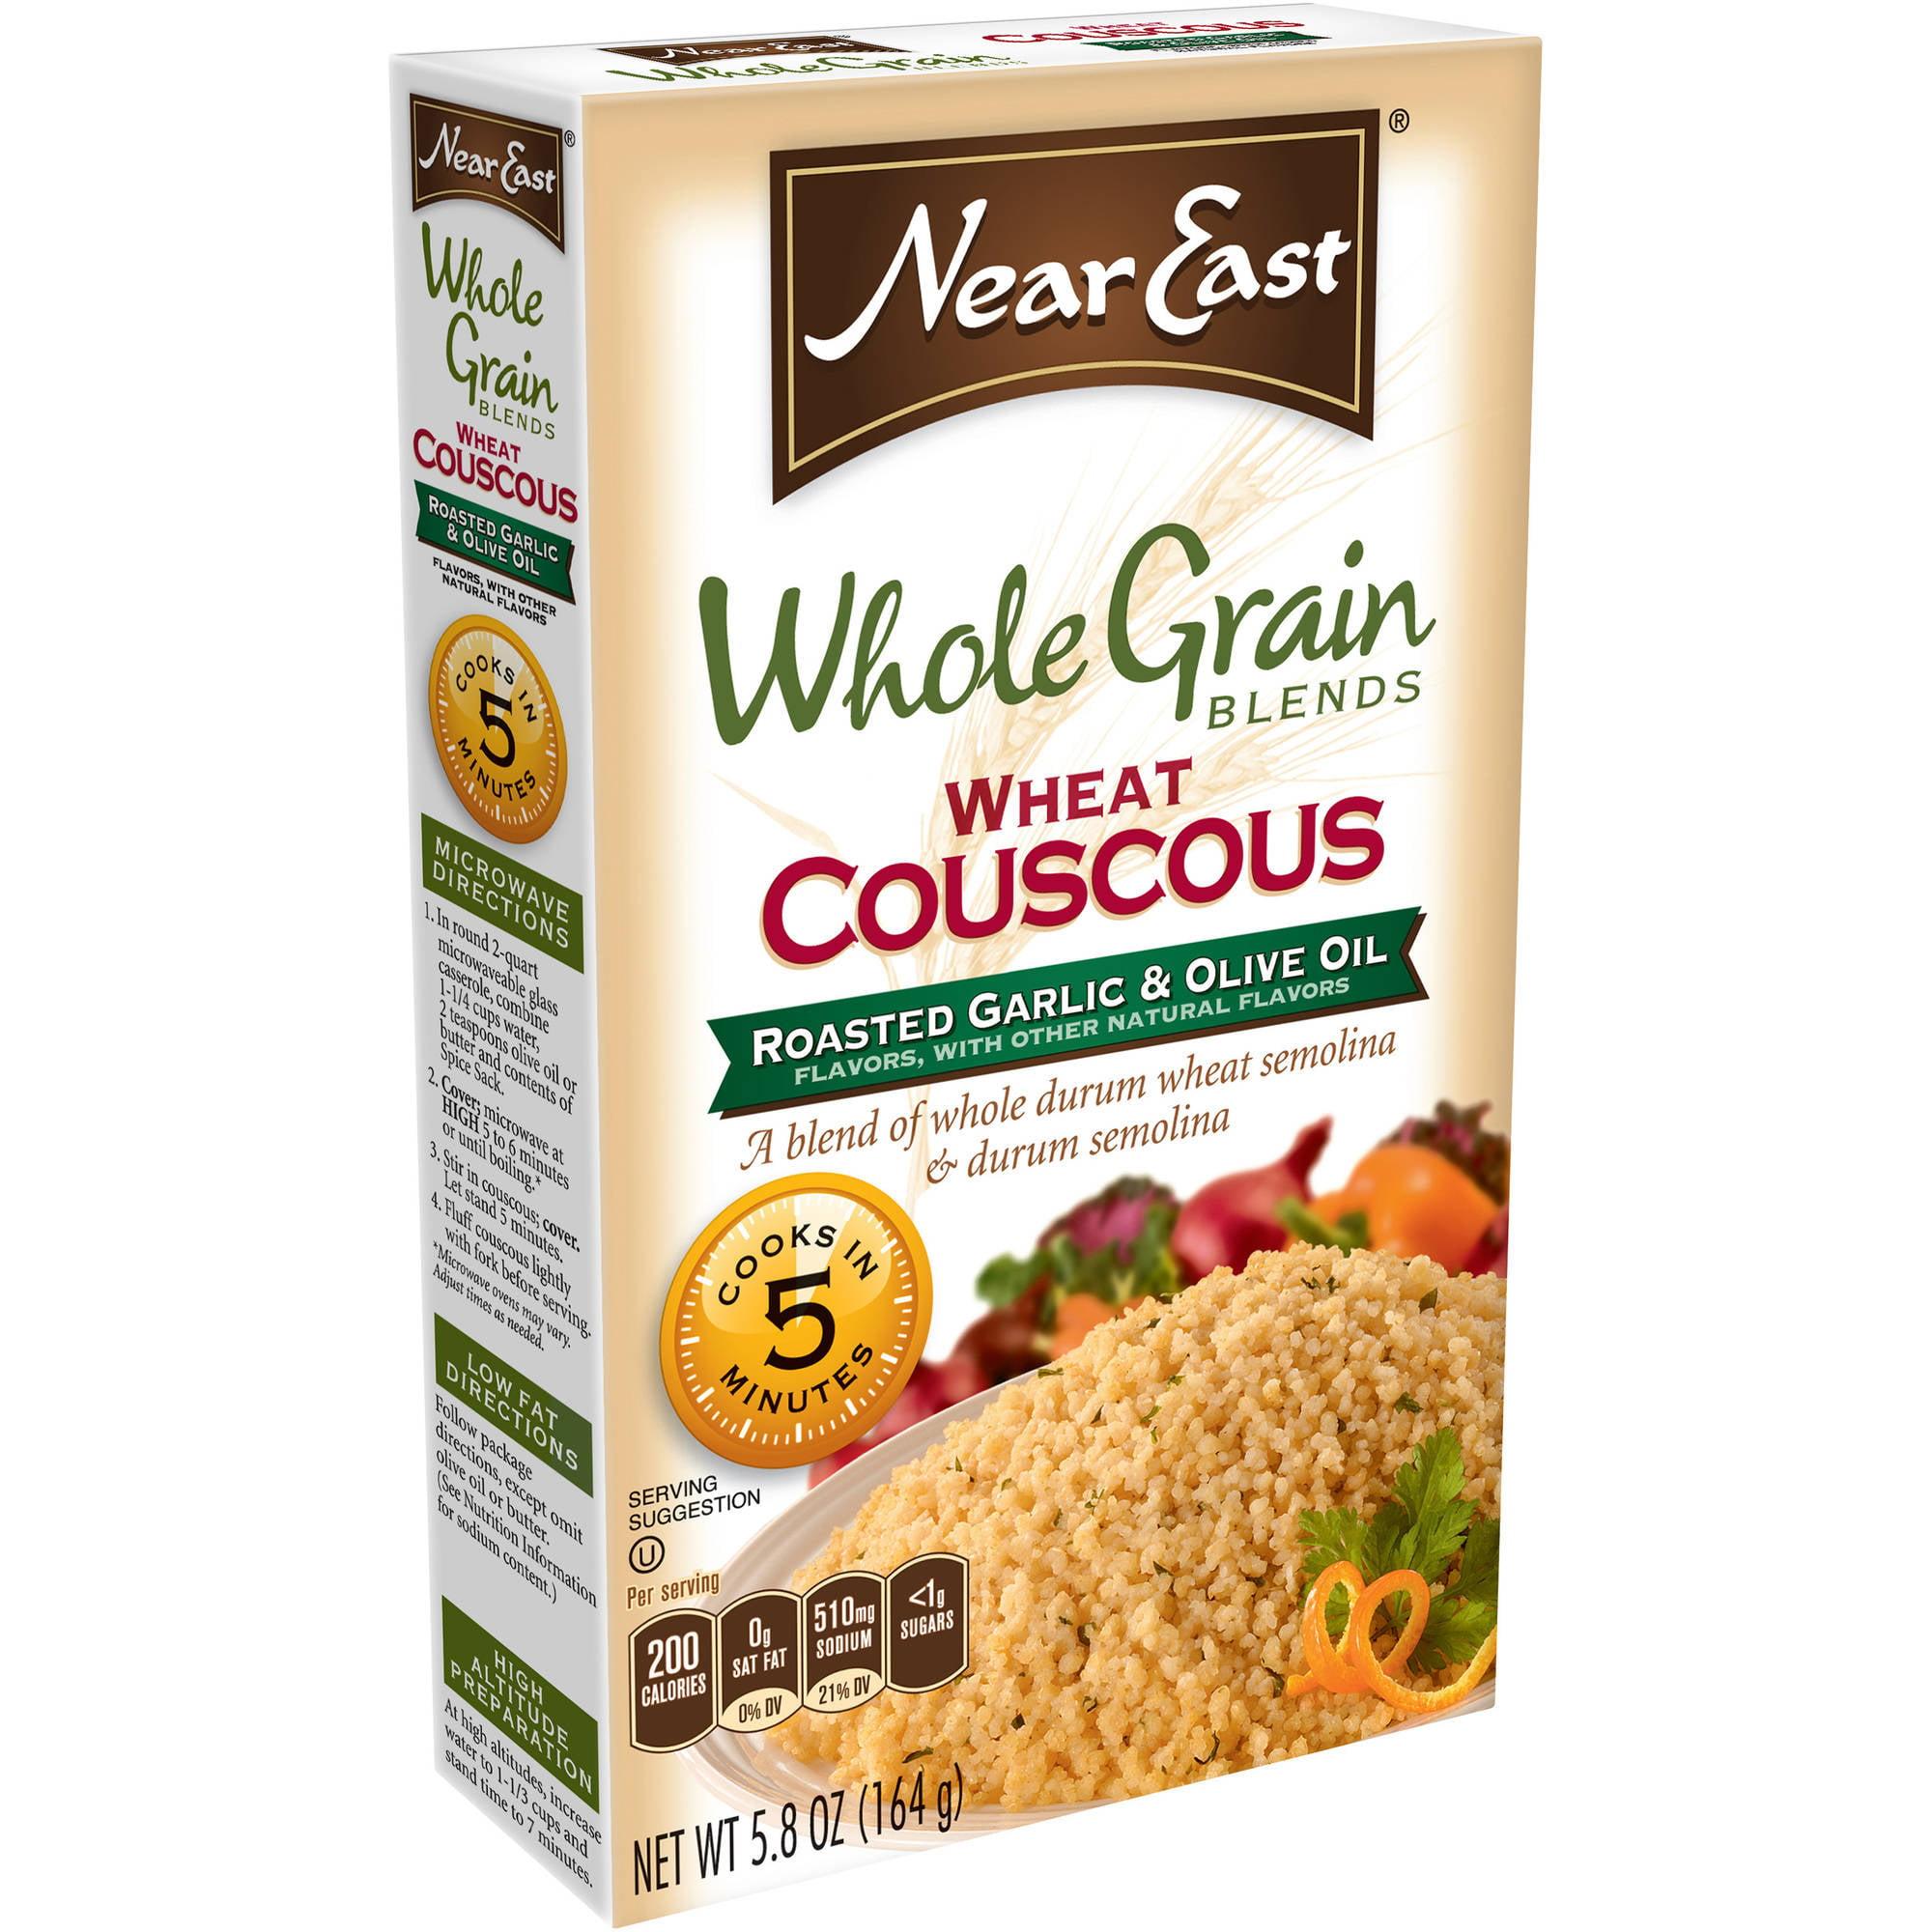 Near East Whole Grain Blends Roasted Garlic & Olive Oil Wheat Couscous, 5.8 oz